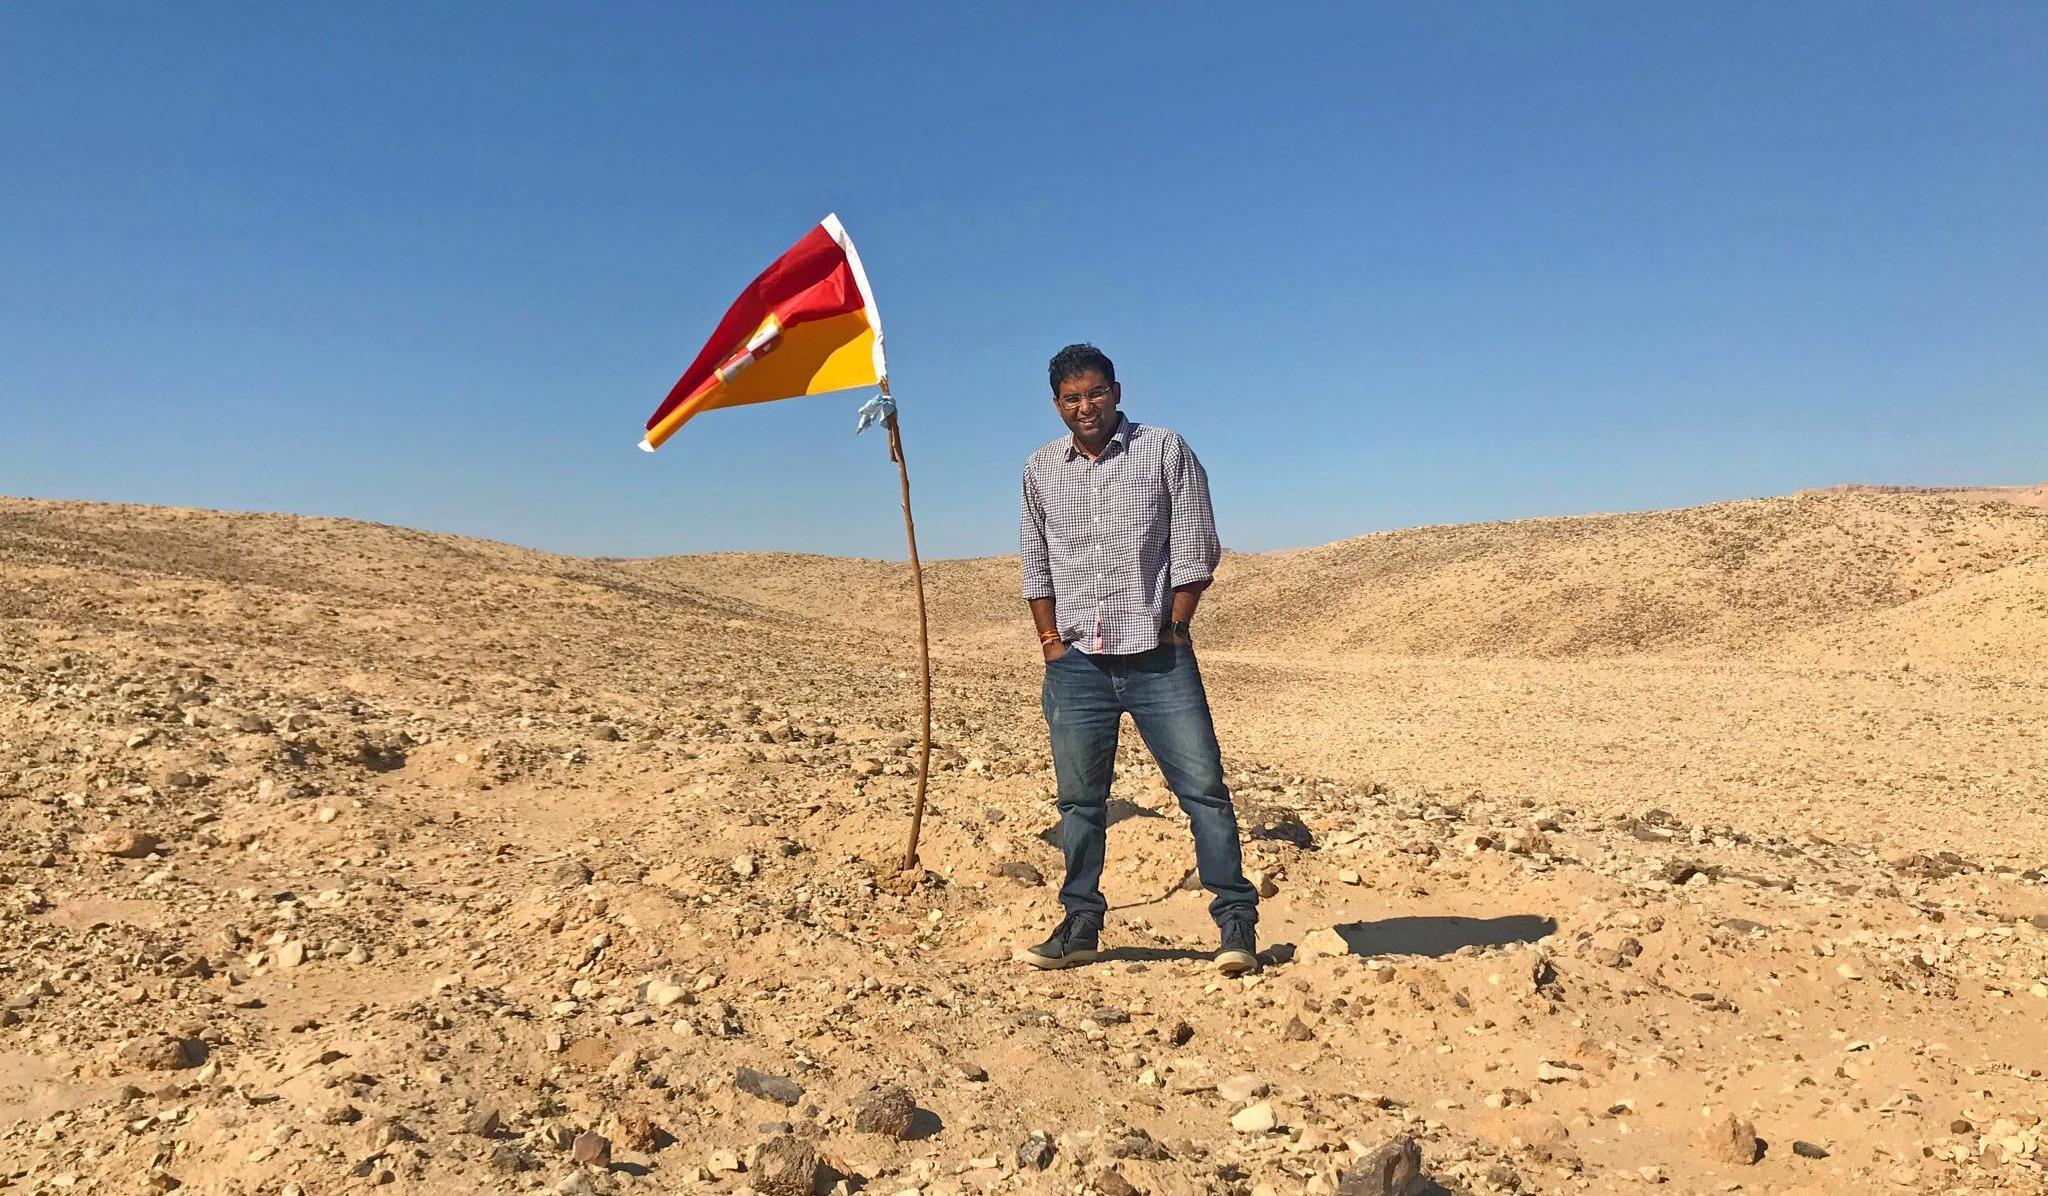 http://shbabbek.com/upload/حصل على موافقة الجيش.. «هندي» يُنصّب نفسه ملكًا على أرض بين «مصر والسودان» |صور